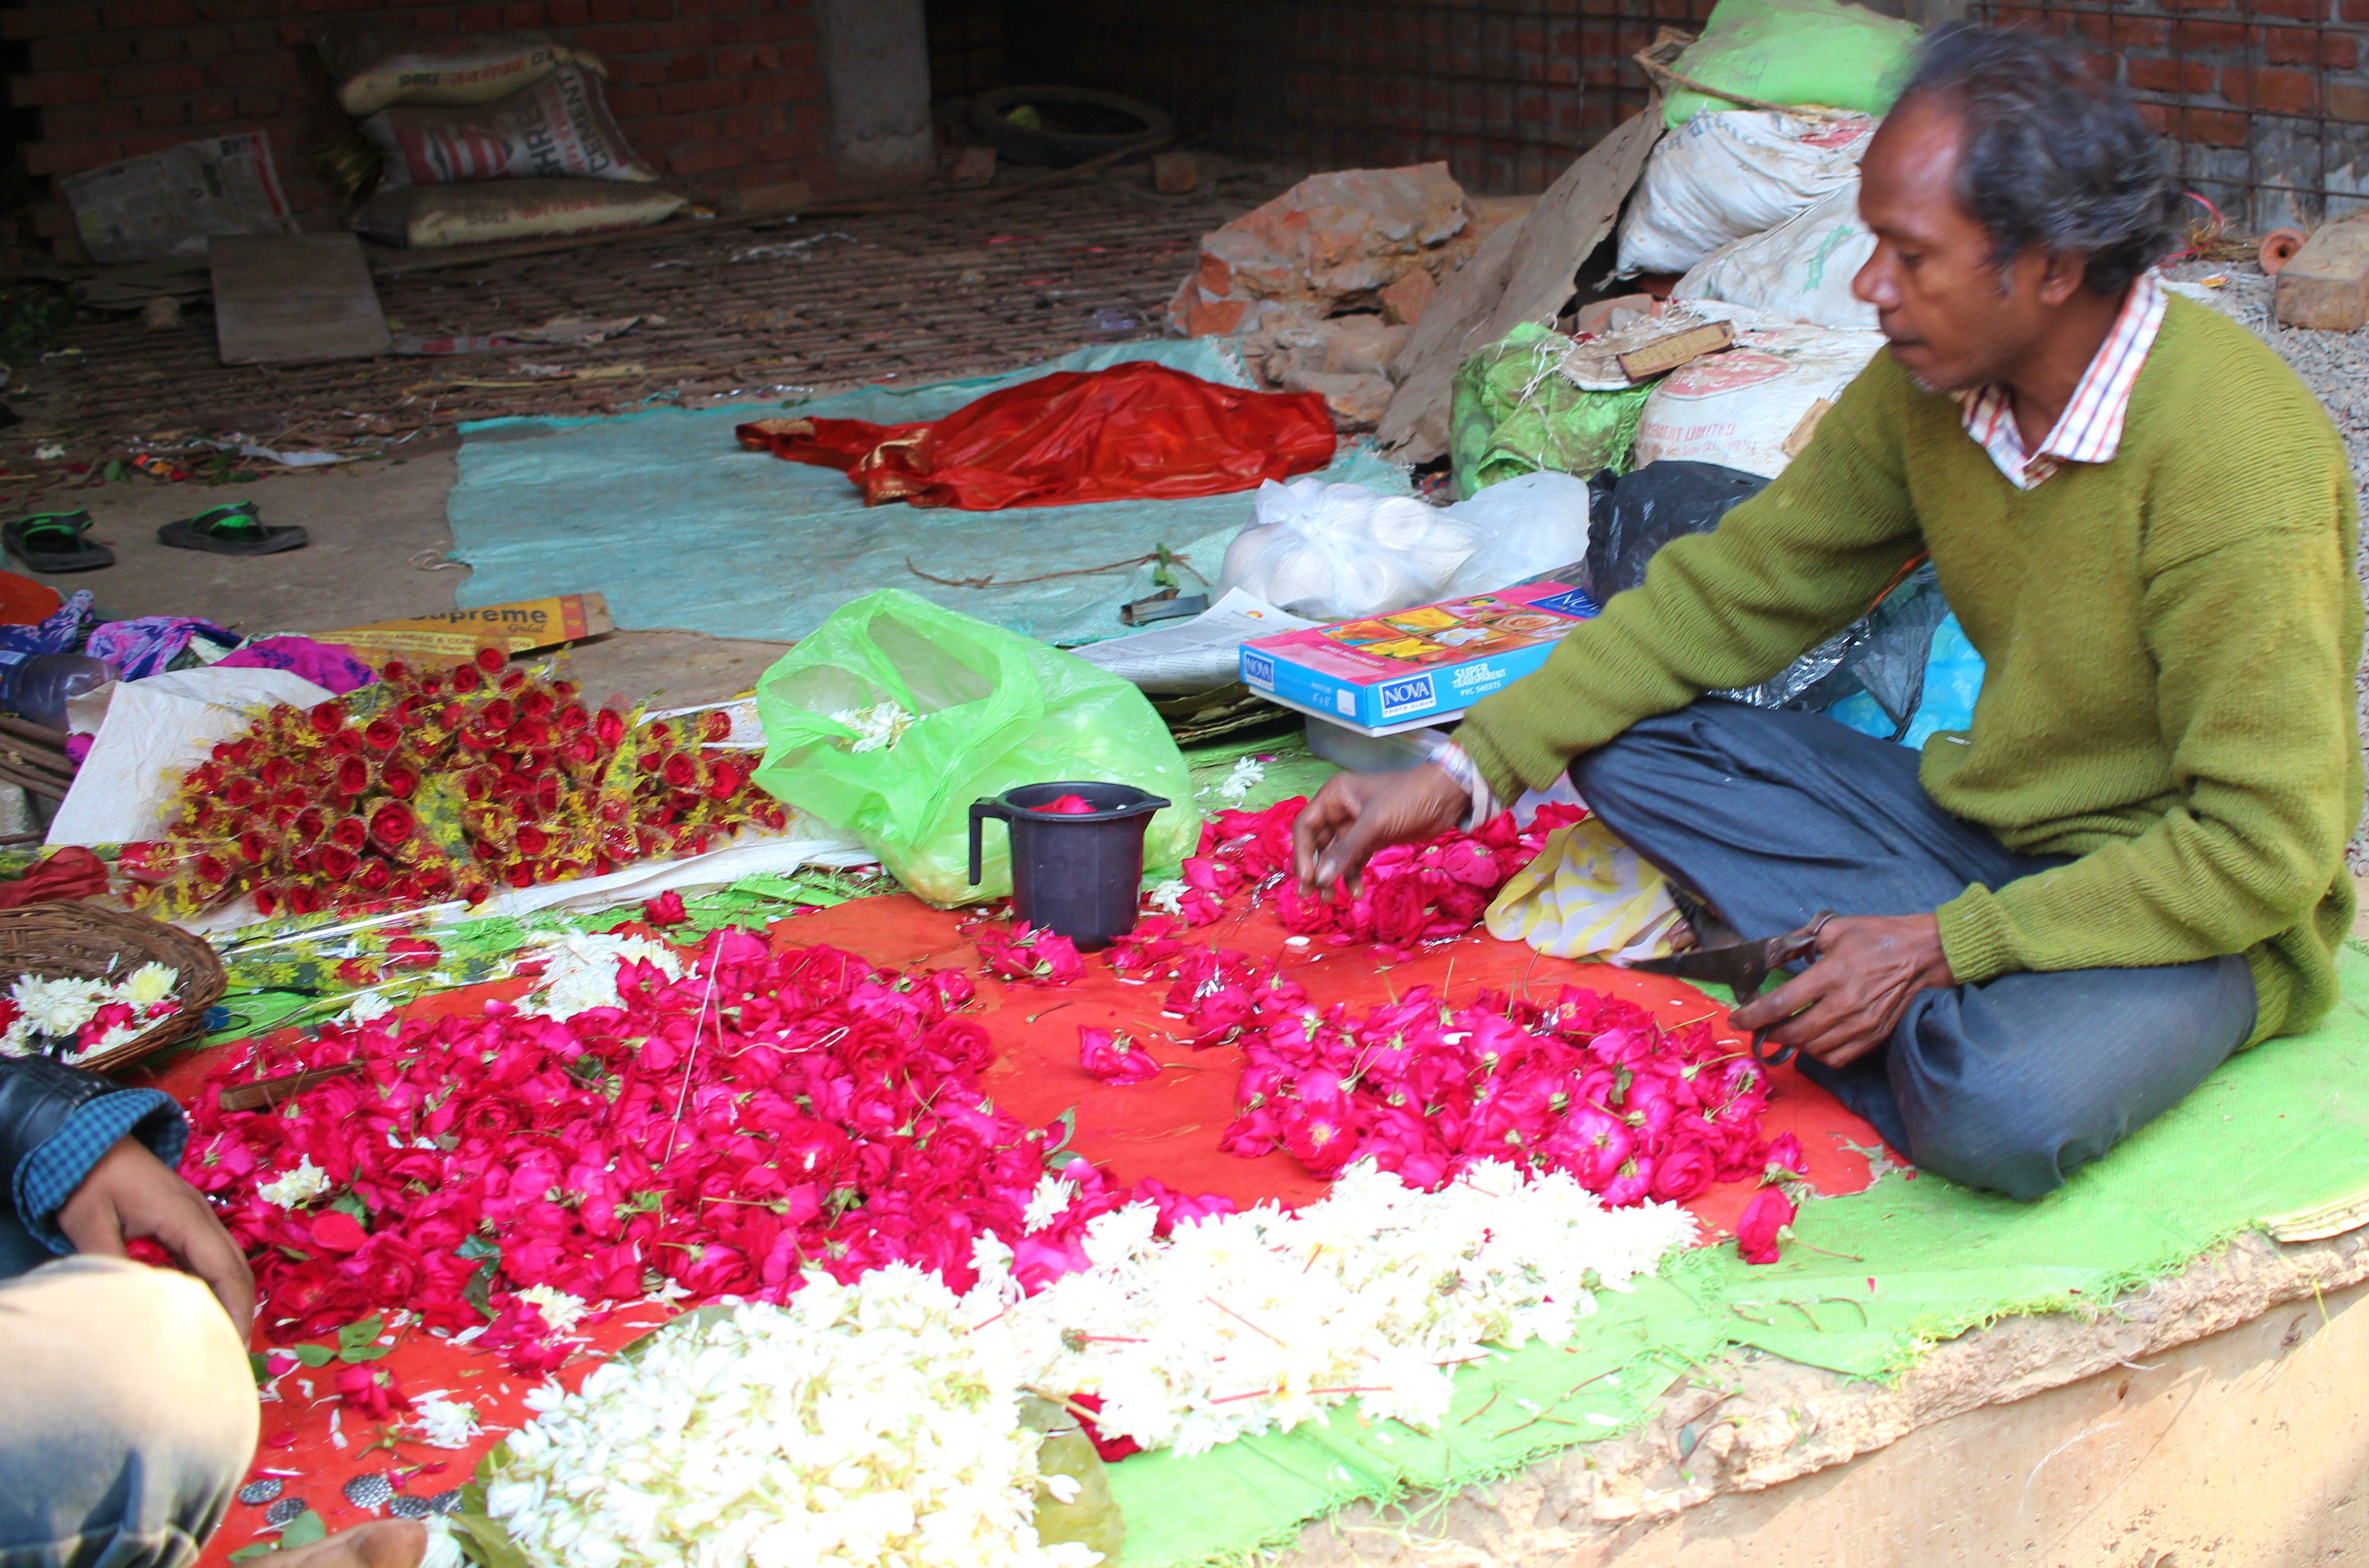 phool wali gali, chowk, lucknow, uttar pradesh, india